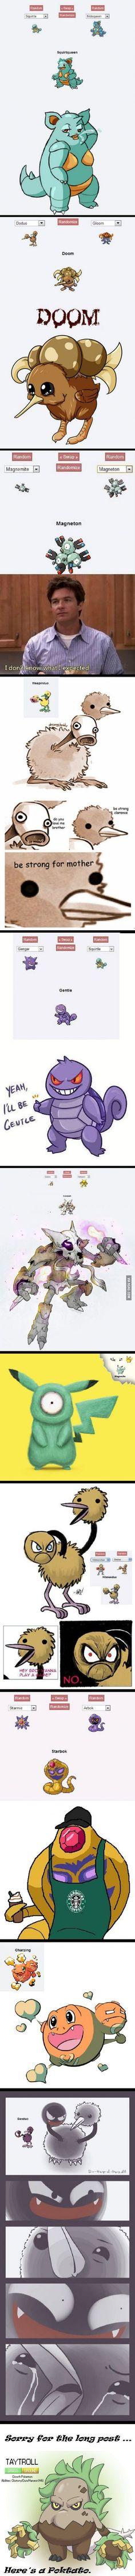 11 creepiest Pokémon Fusions ever